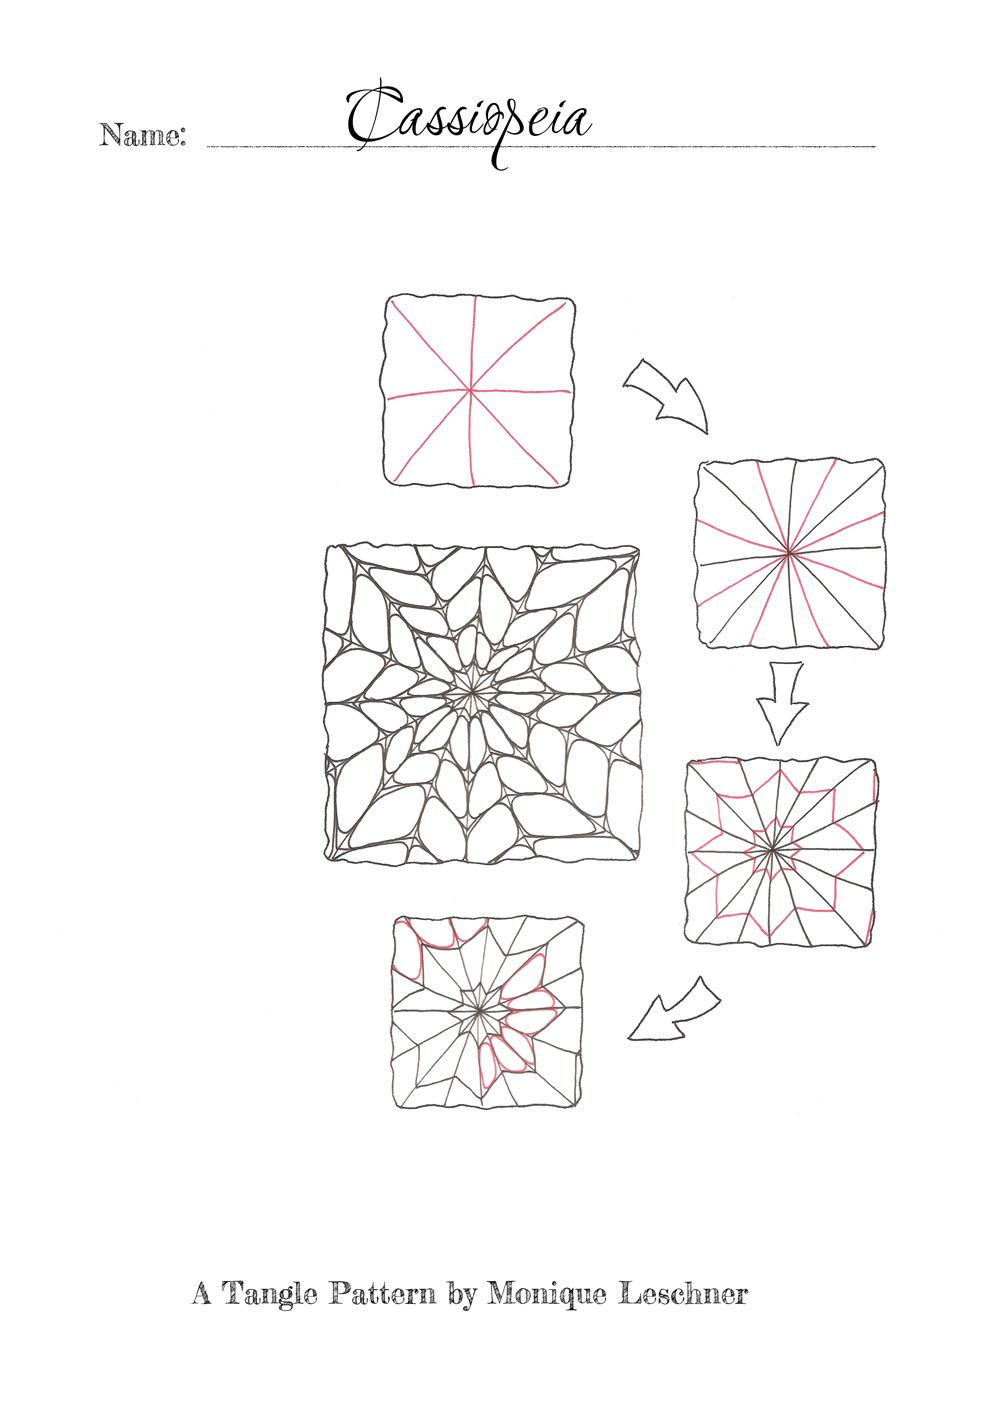 cassiopeia zentangle tangles pinterest fehler willkommen und muster. Black Bedroom Furniture Sets. Home Design Ideas